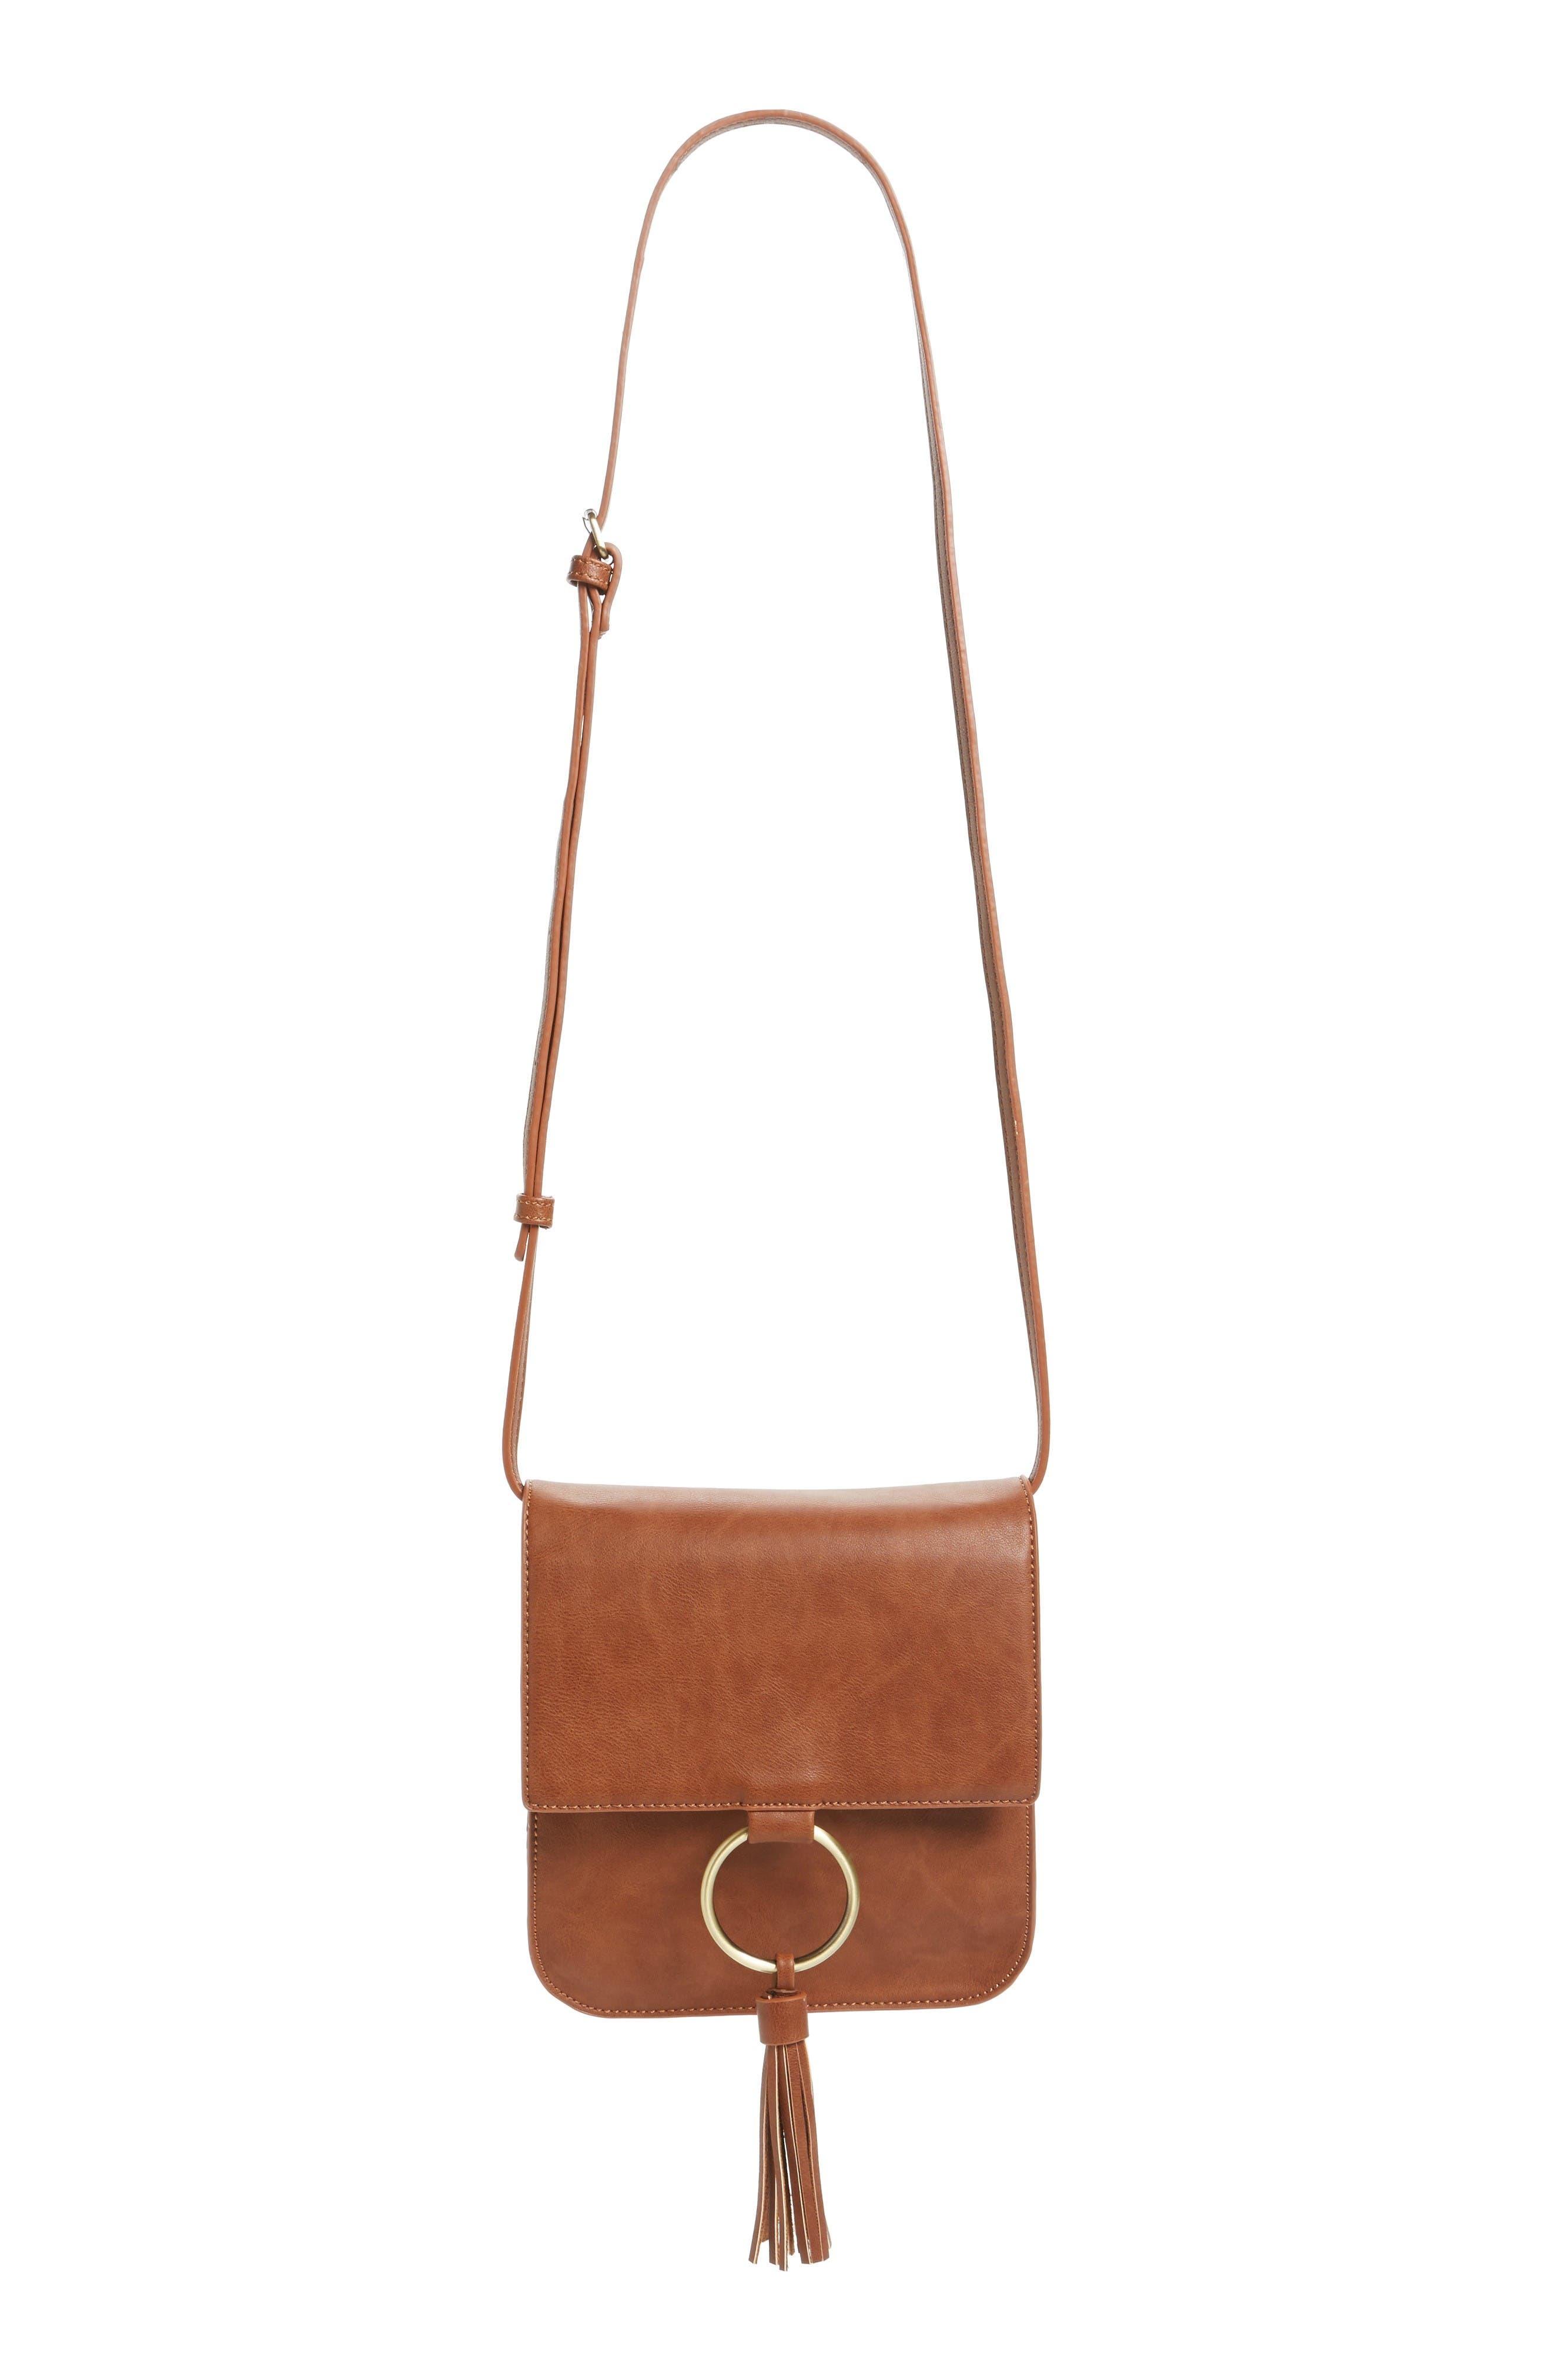 Main Image - Sole Society Square Crossbody Bag